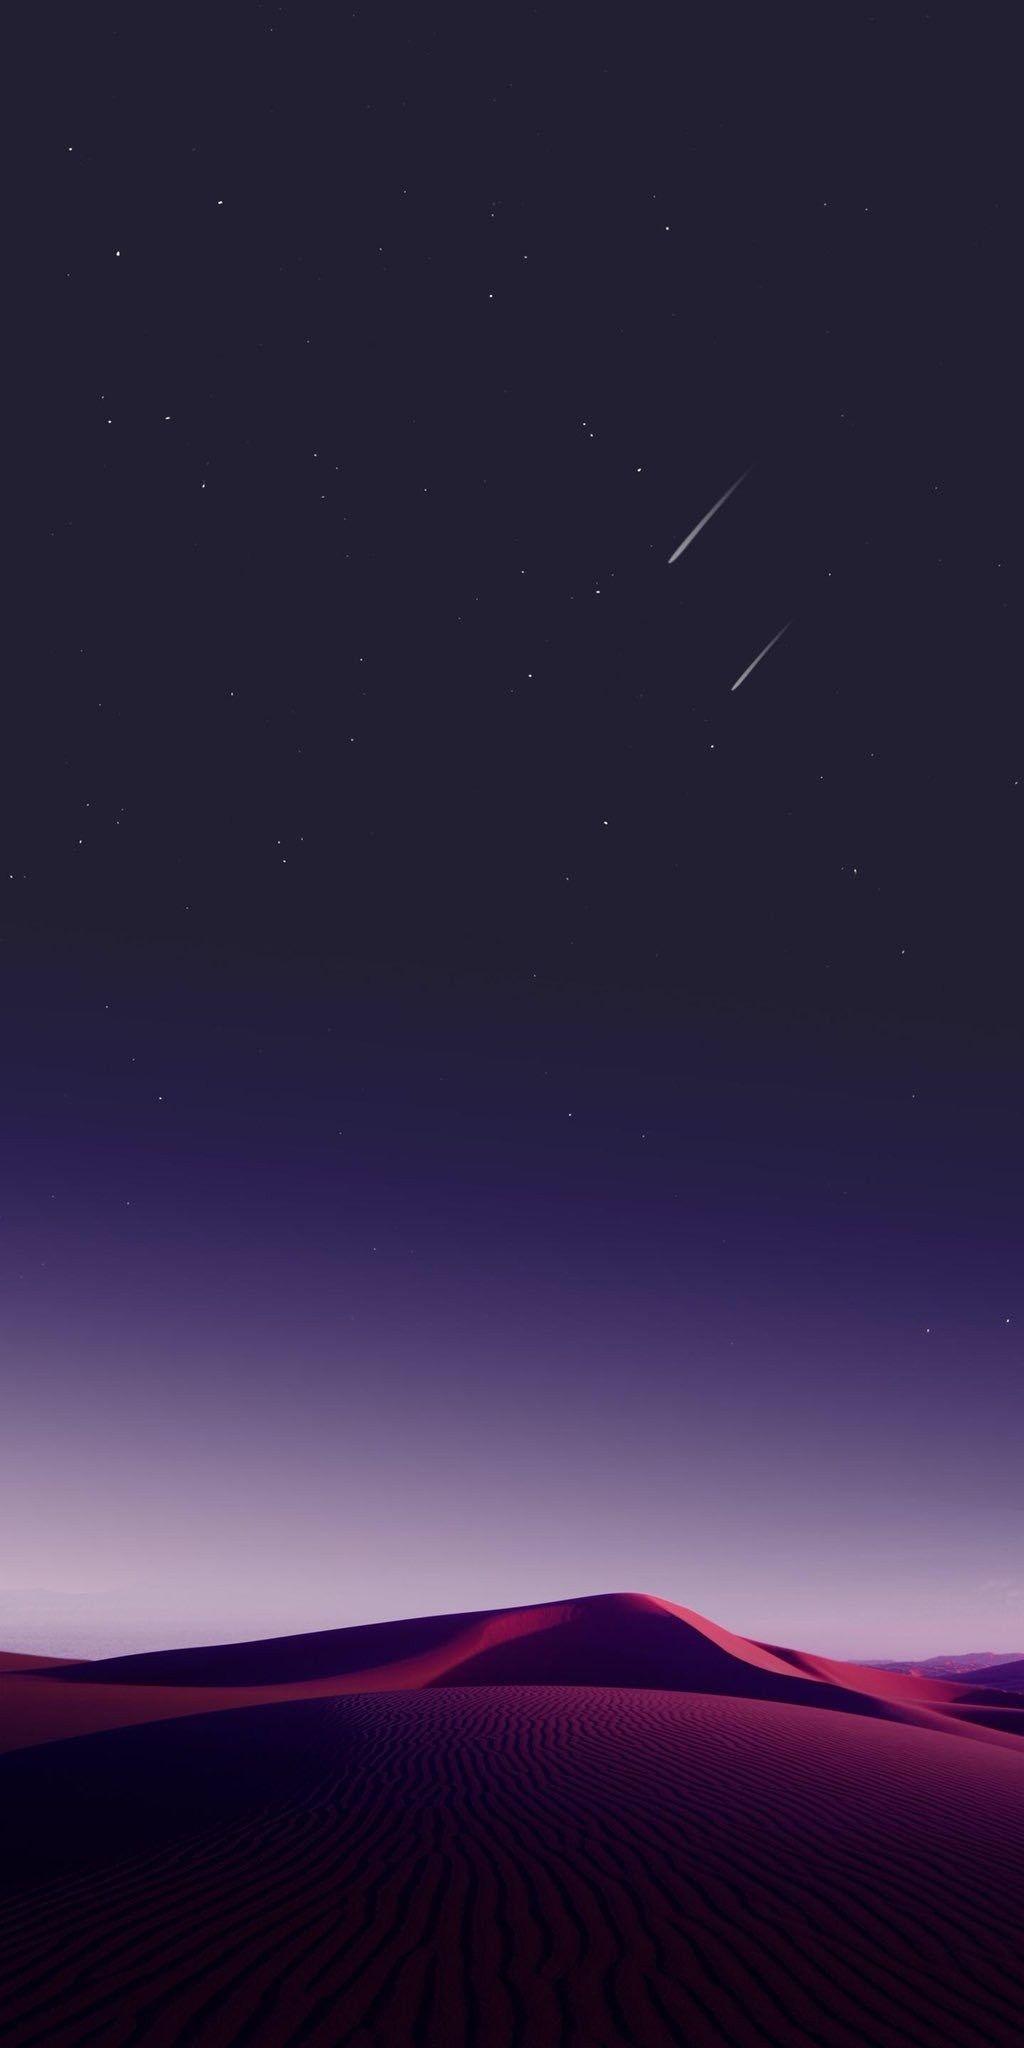 Simple Wallpaper Night Galaxy - bb4908cb54ef7bd2ca9db98d8fe46808  Image-552666.jpg